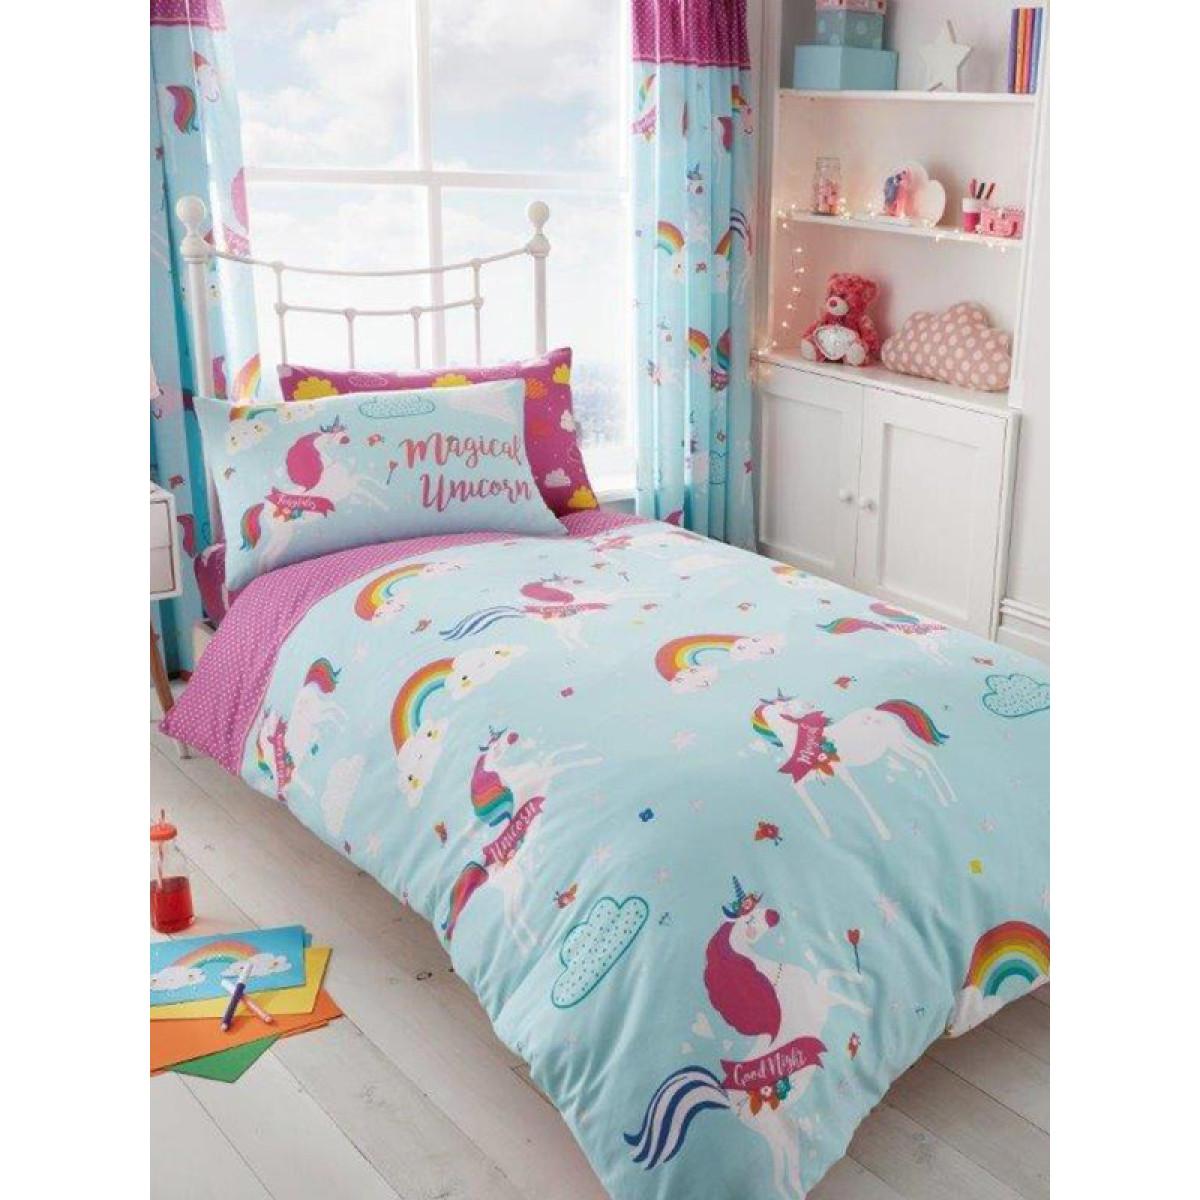 Unicorn Clouds Single Duvet Cover Bedding Bedroom